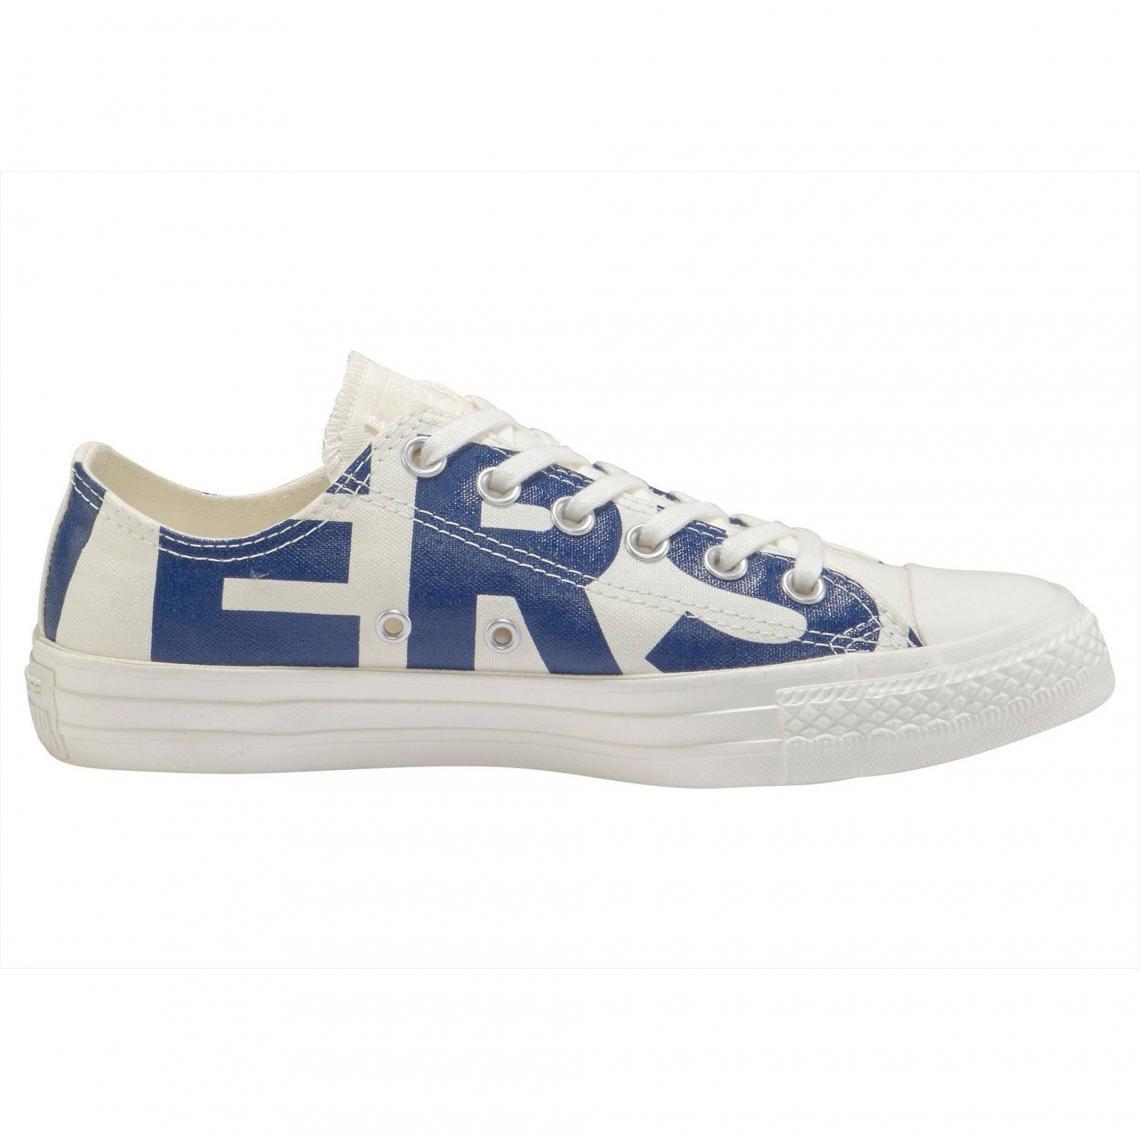 eb92a425e9628 Converse Chuck Taylor All Star Ox Big Logo Baskets homme - Blanc ...